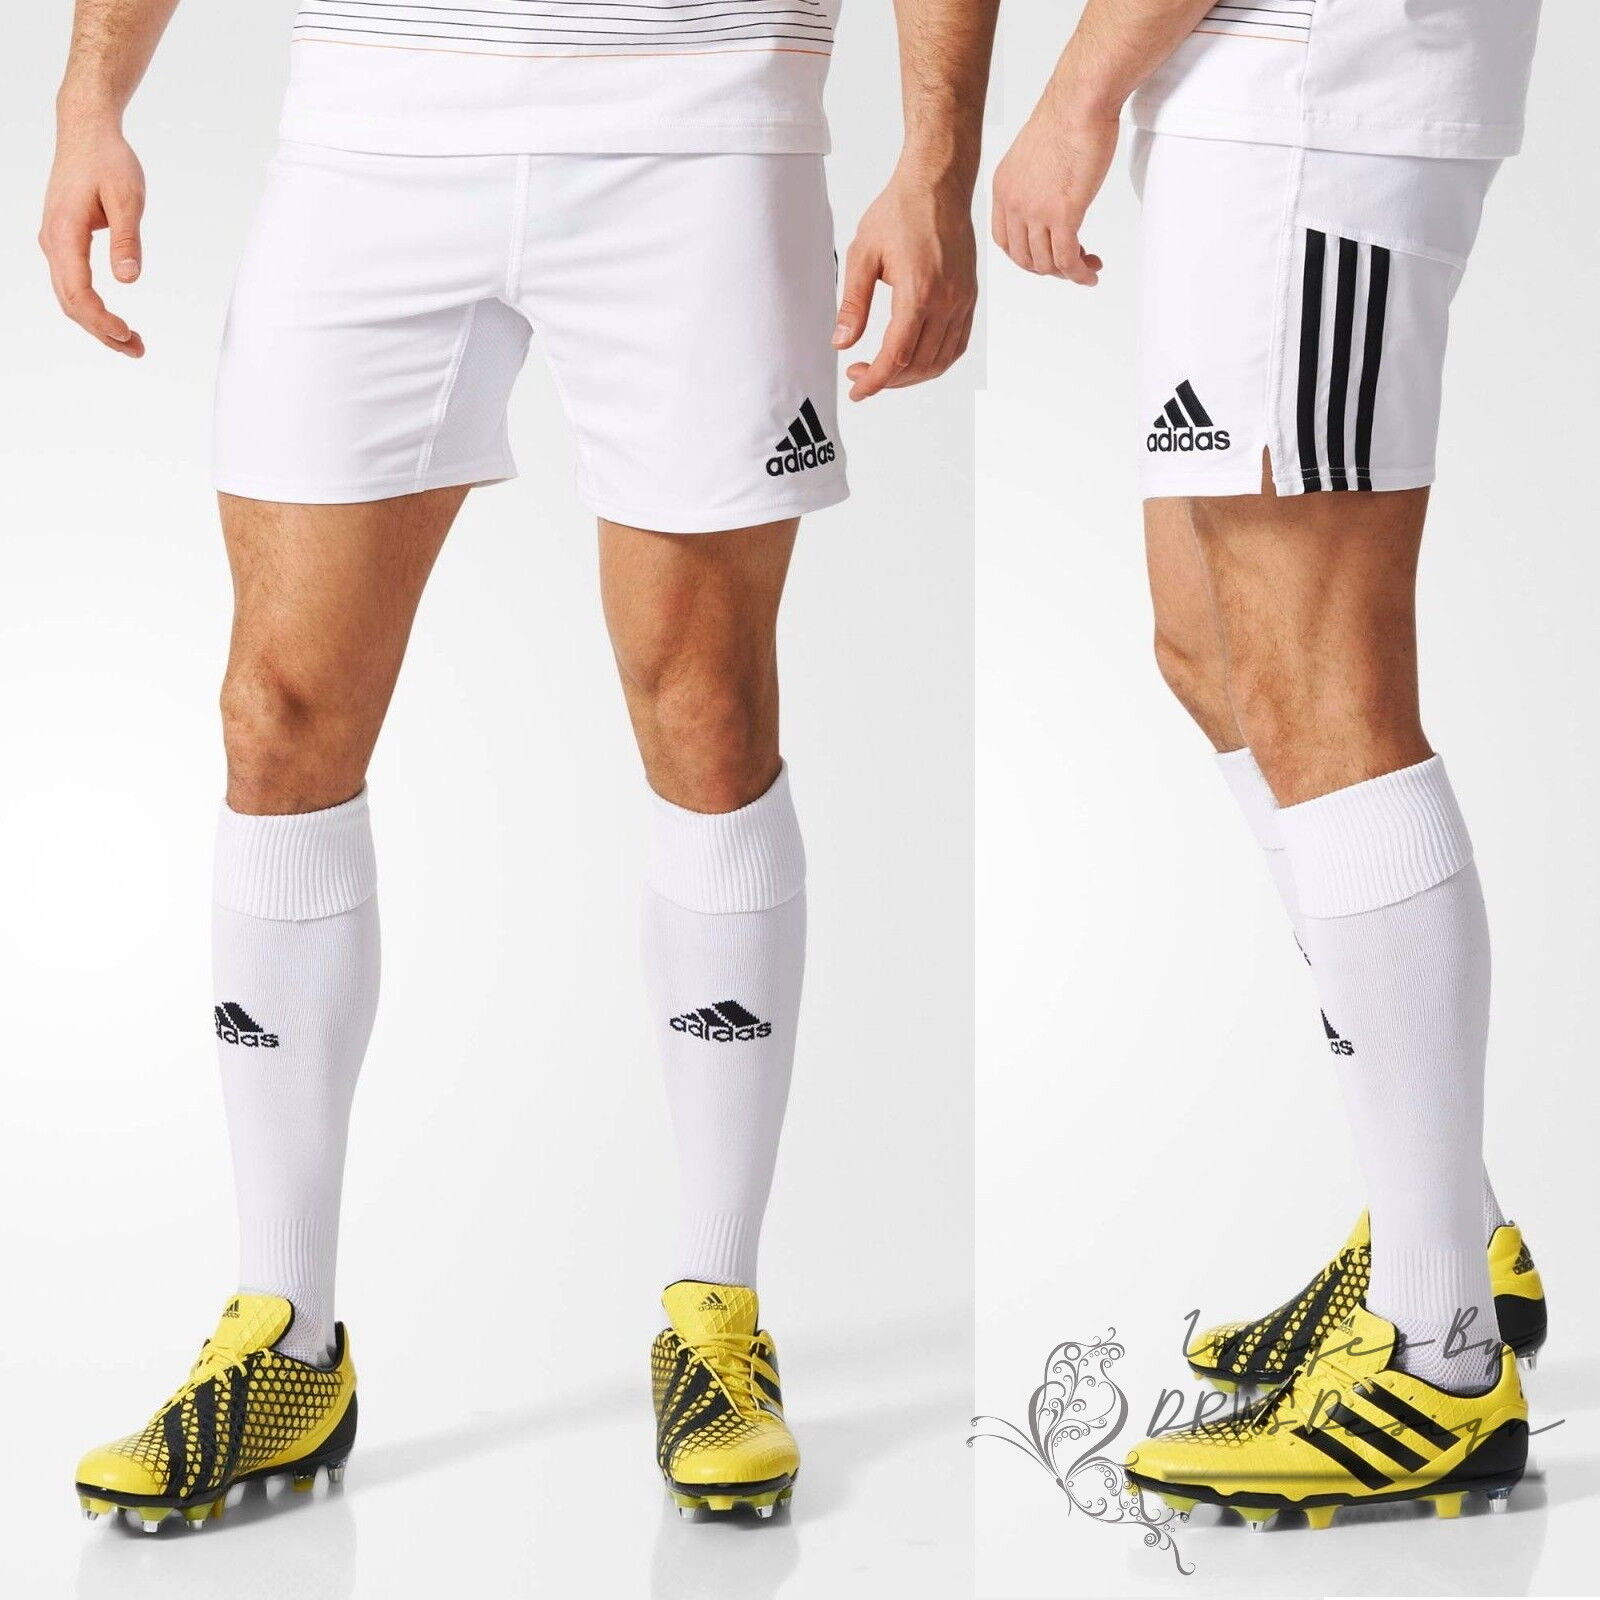 adidas Classic Sportos rövidnadrág Fehér 3 csíkos rögbi Futball rövidnadrág